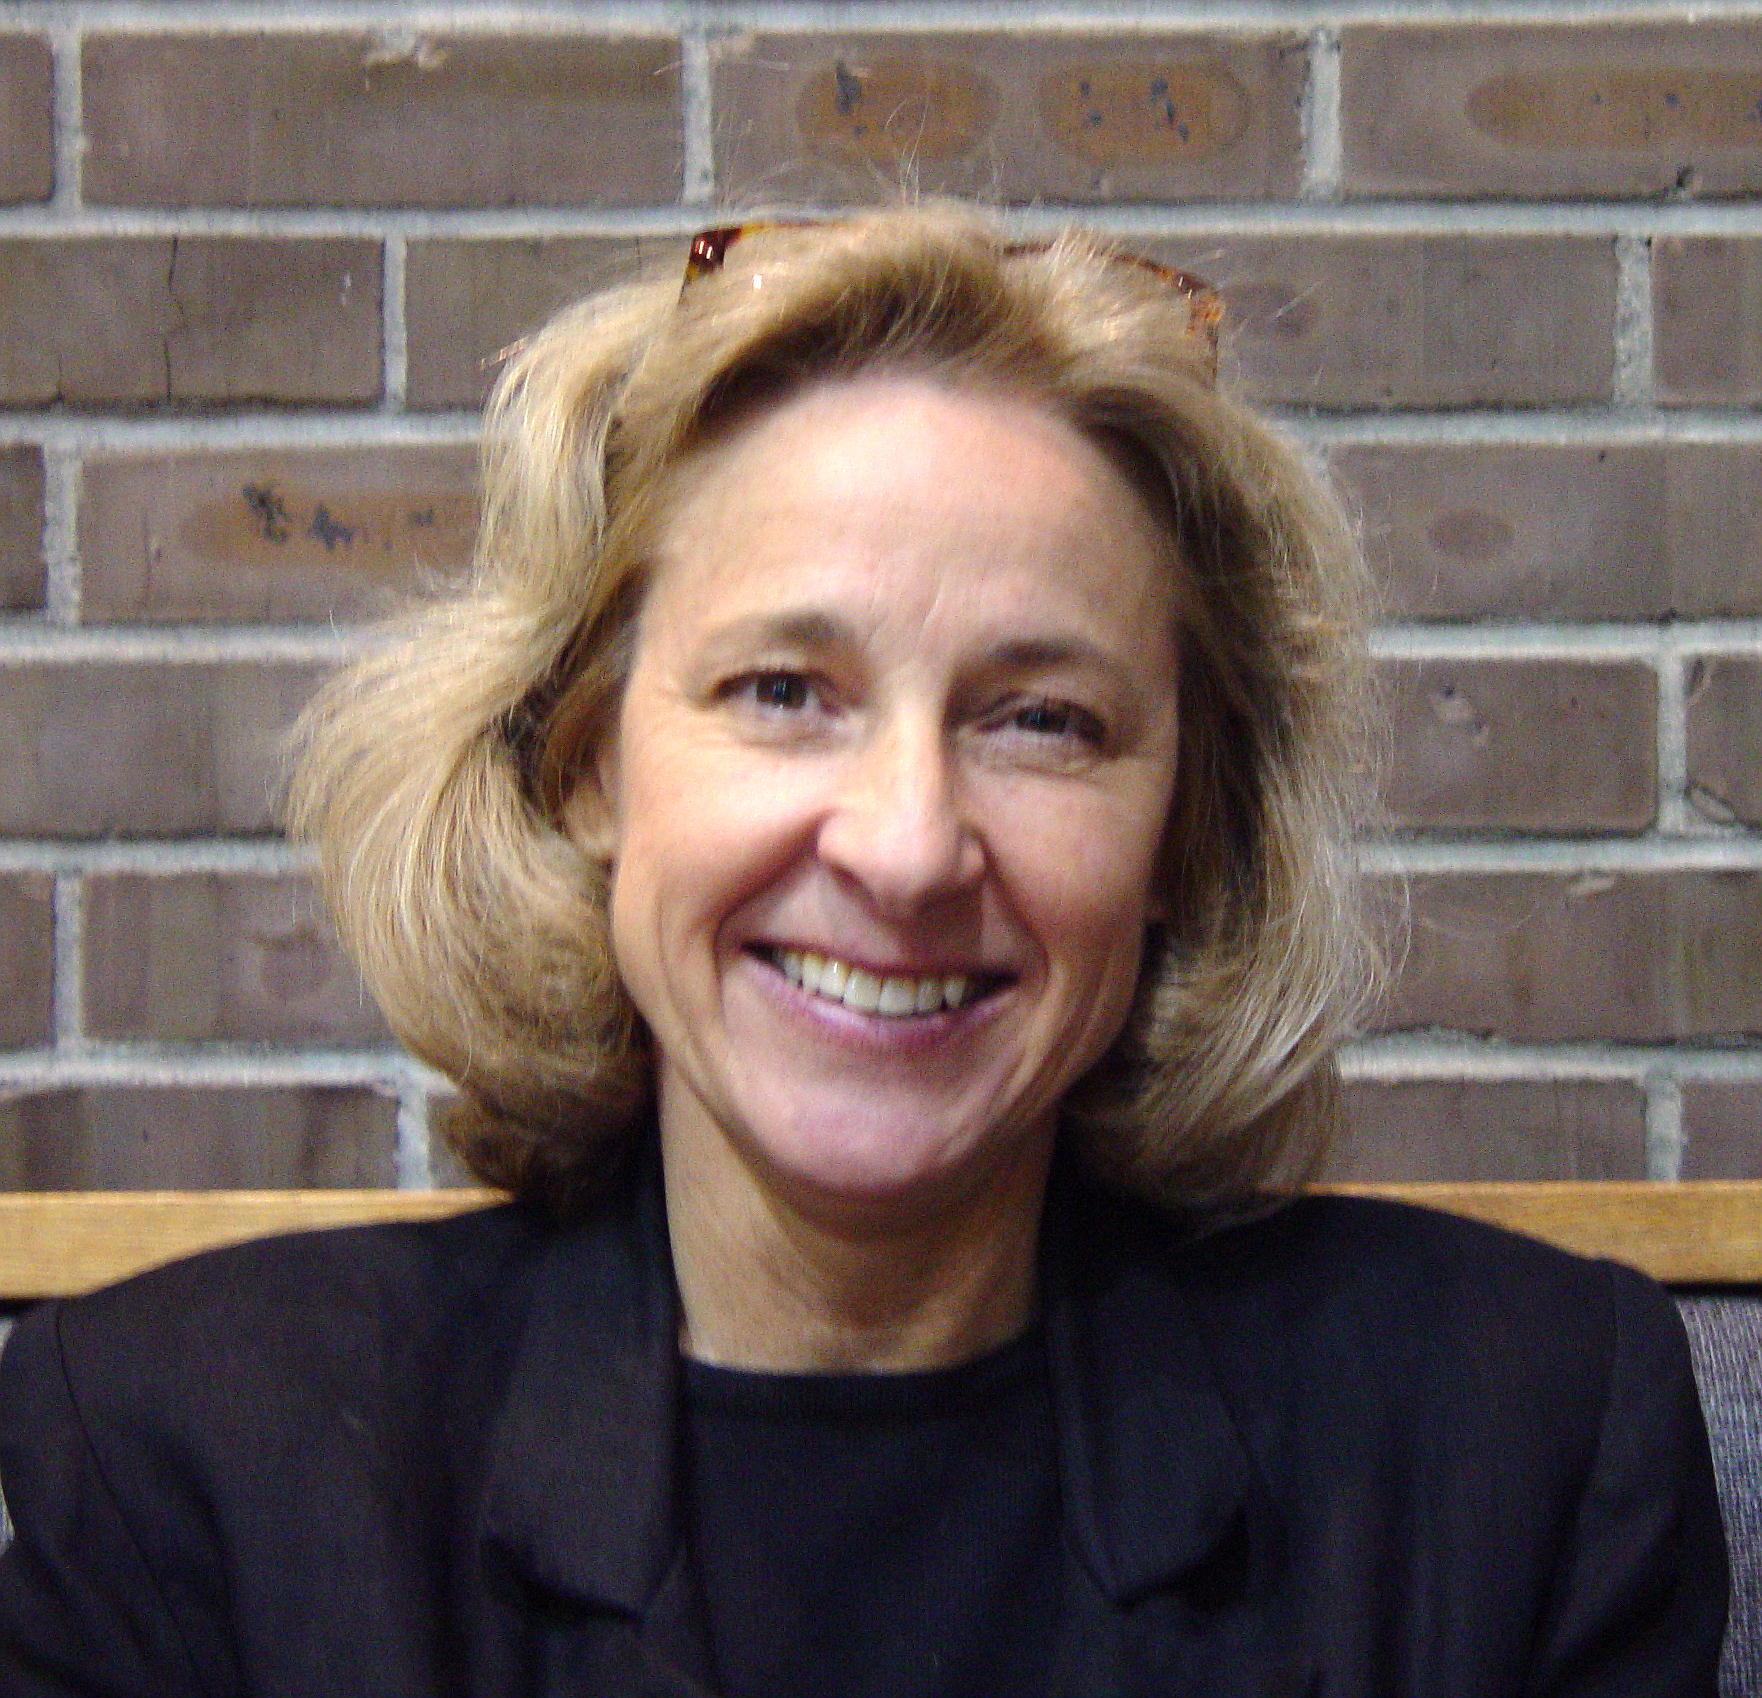 Liste Femanzen Dr. Helen Fisher - Wieviel »Gleichberechtigung ...